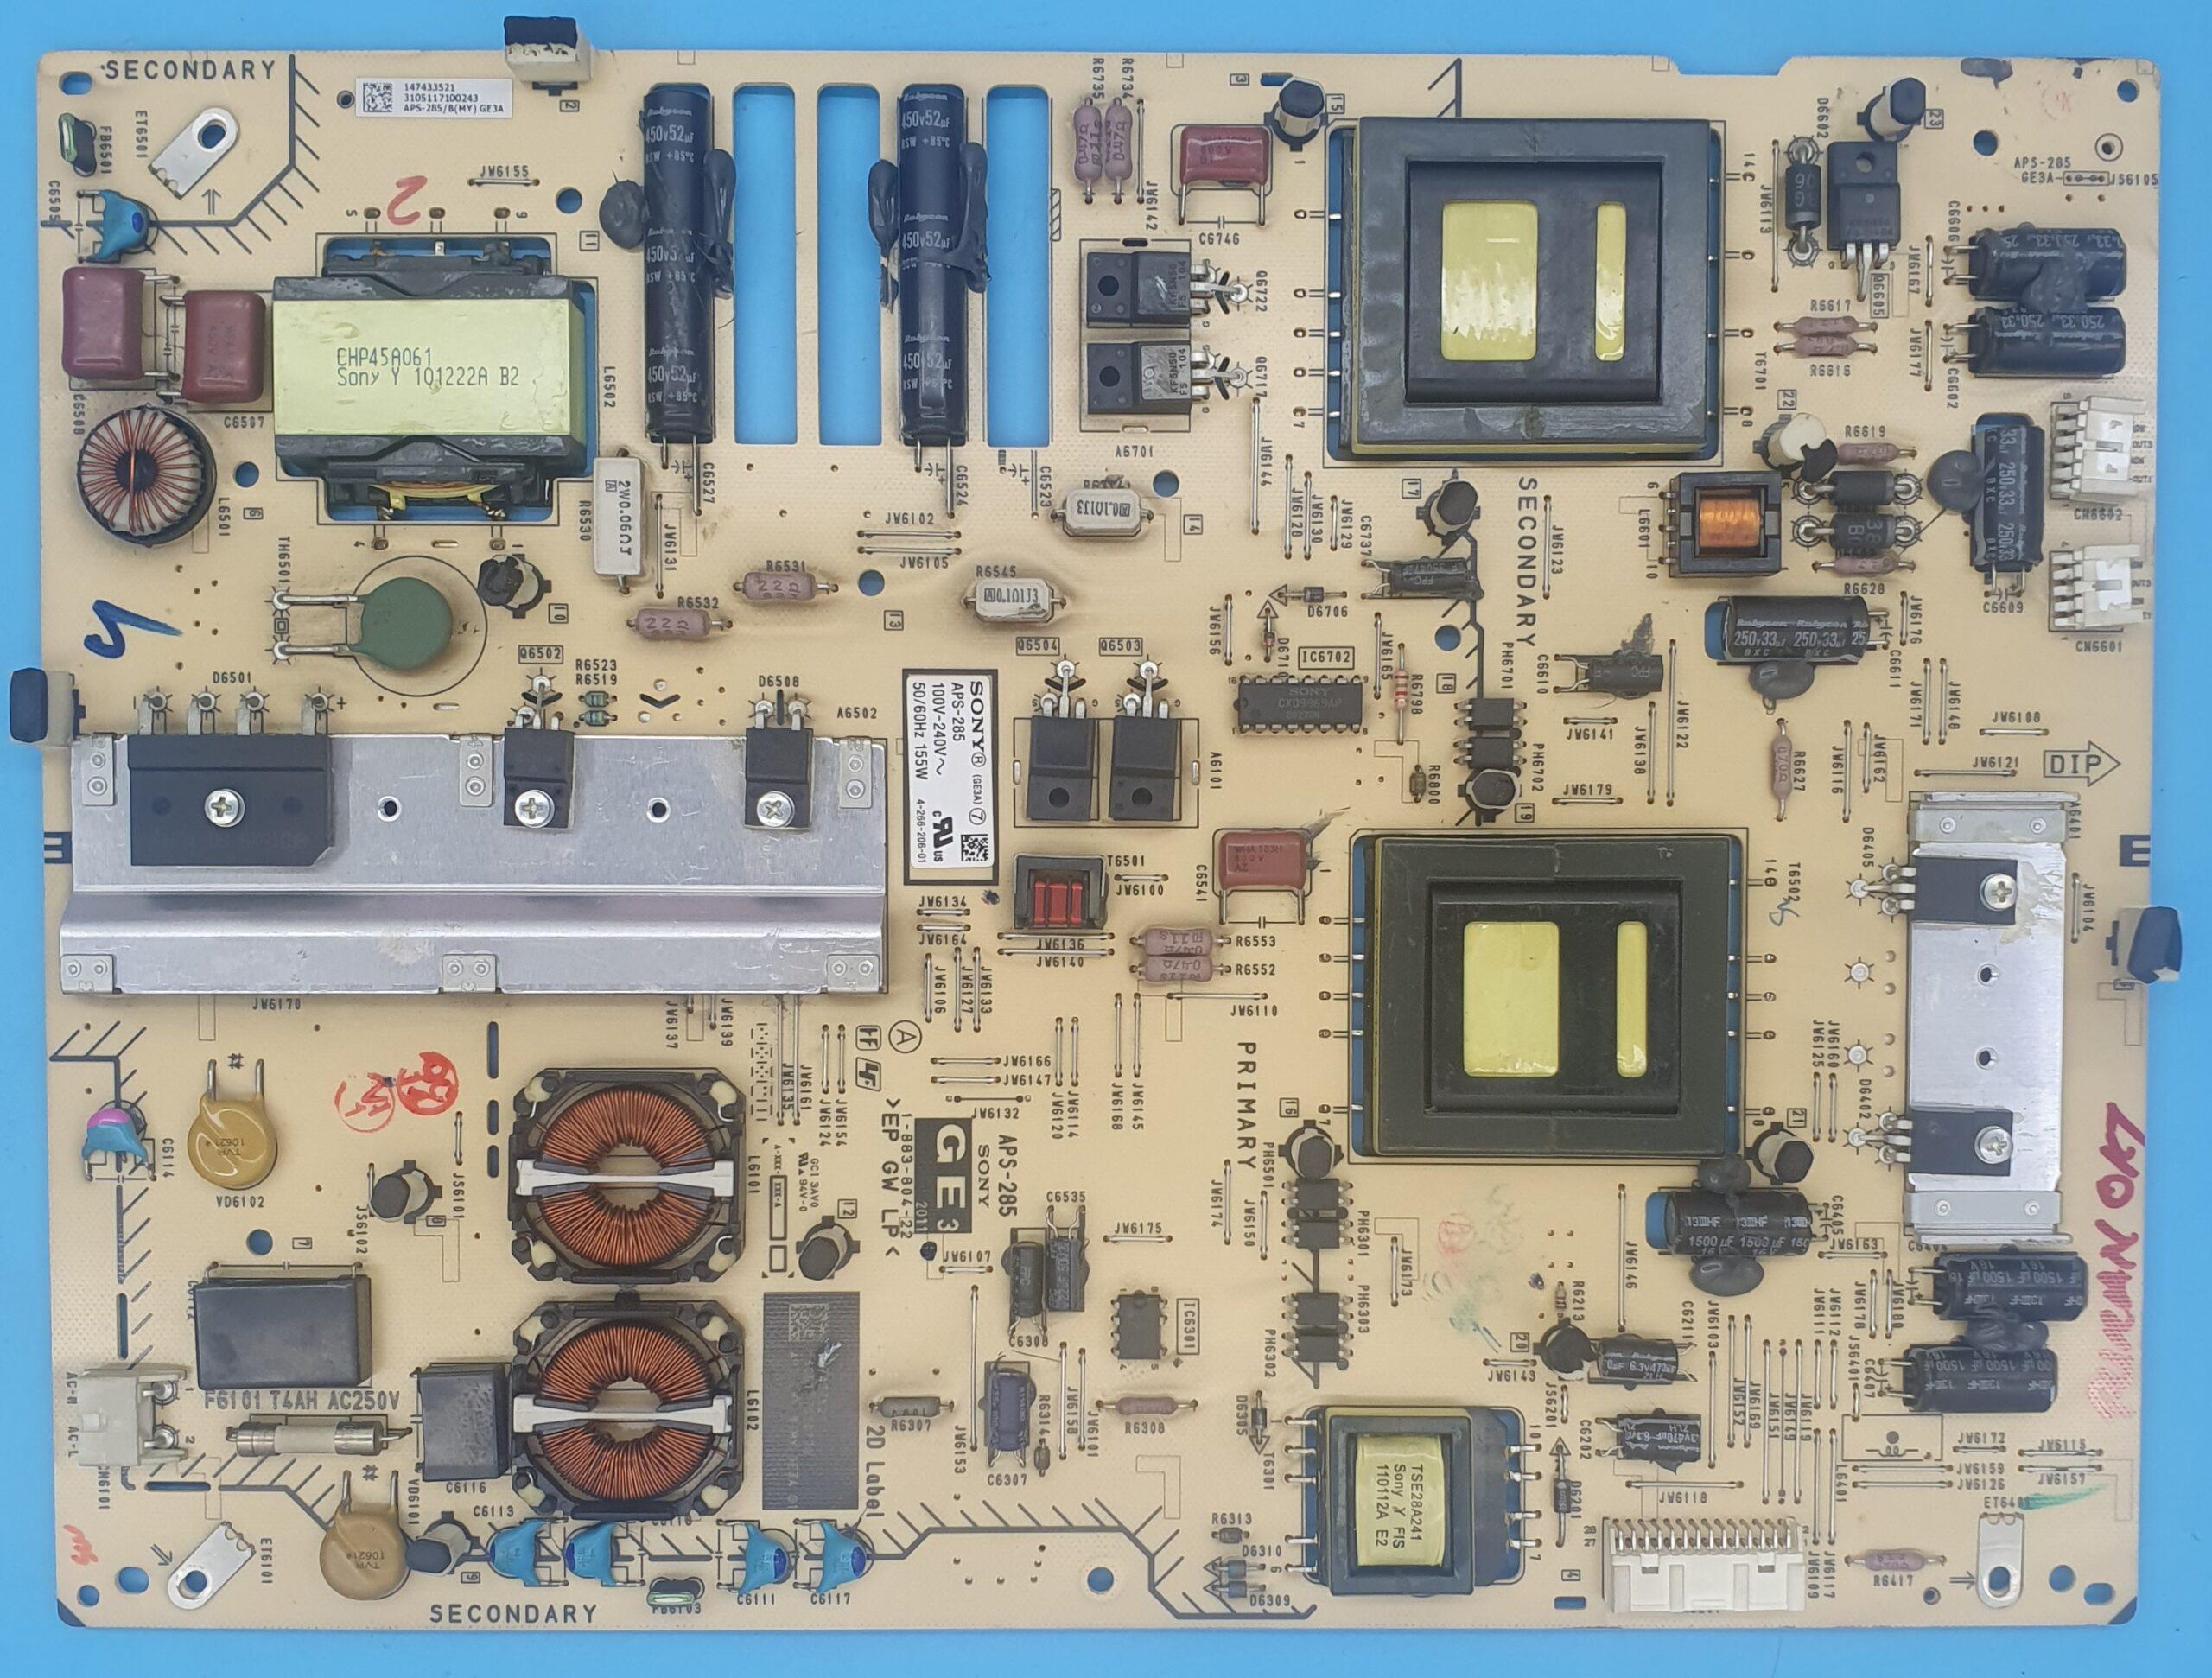 APS-285 Sony Power (KDV DAHİL = 200 TL)